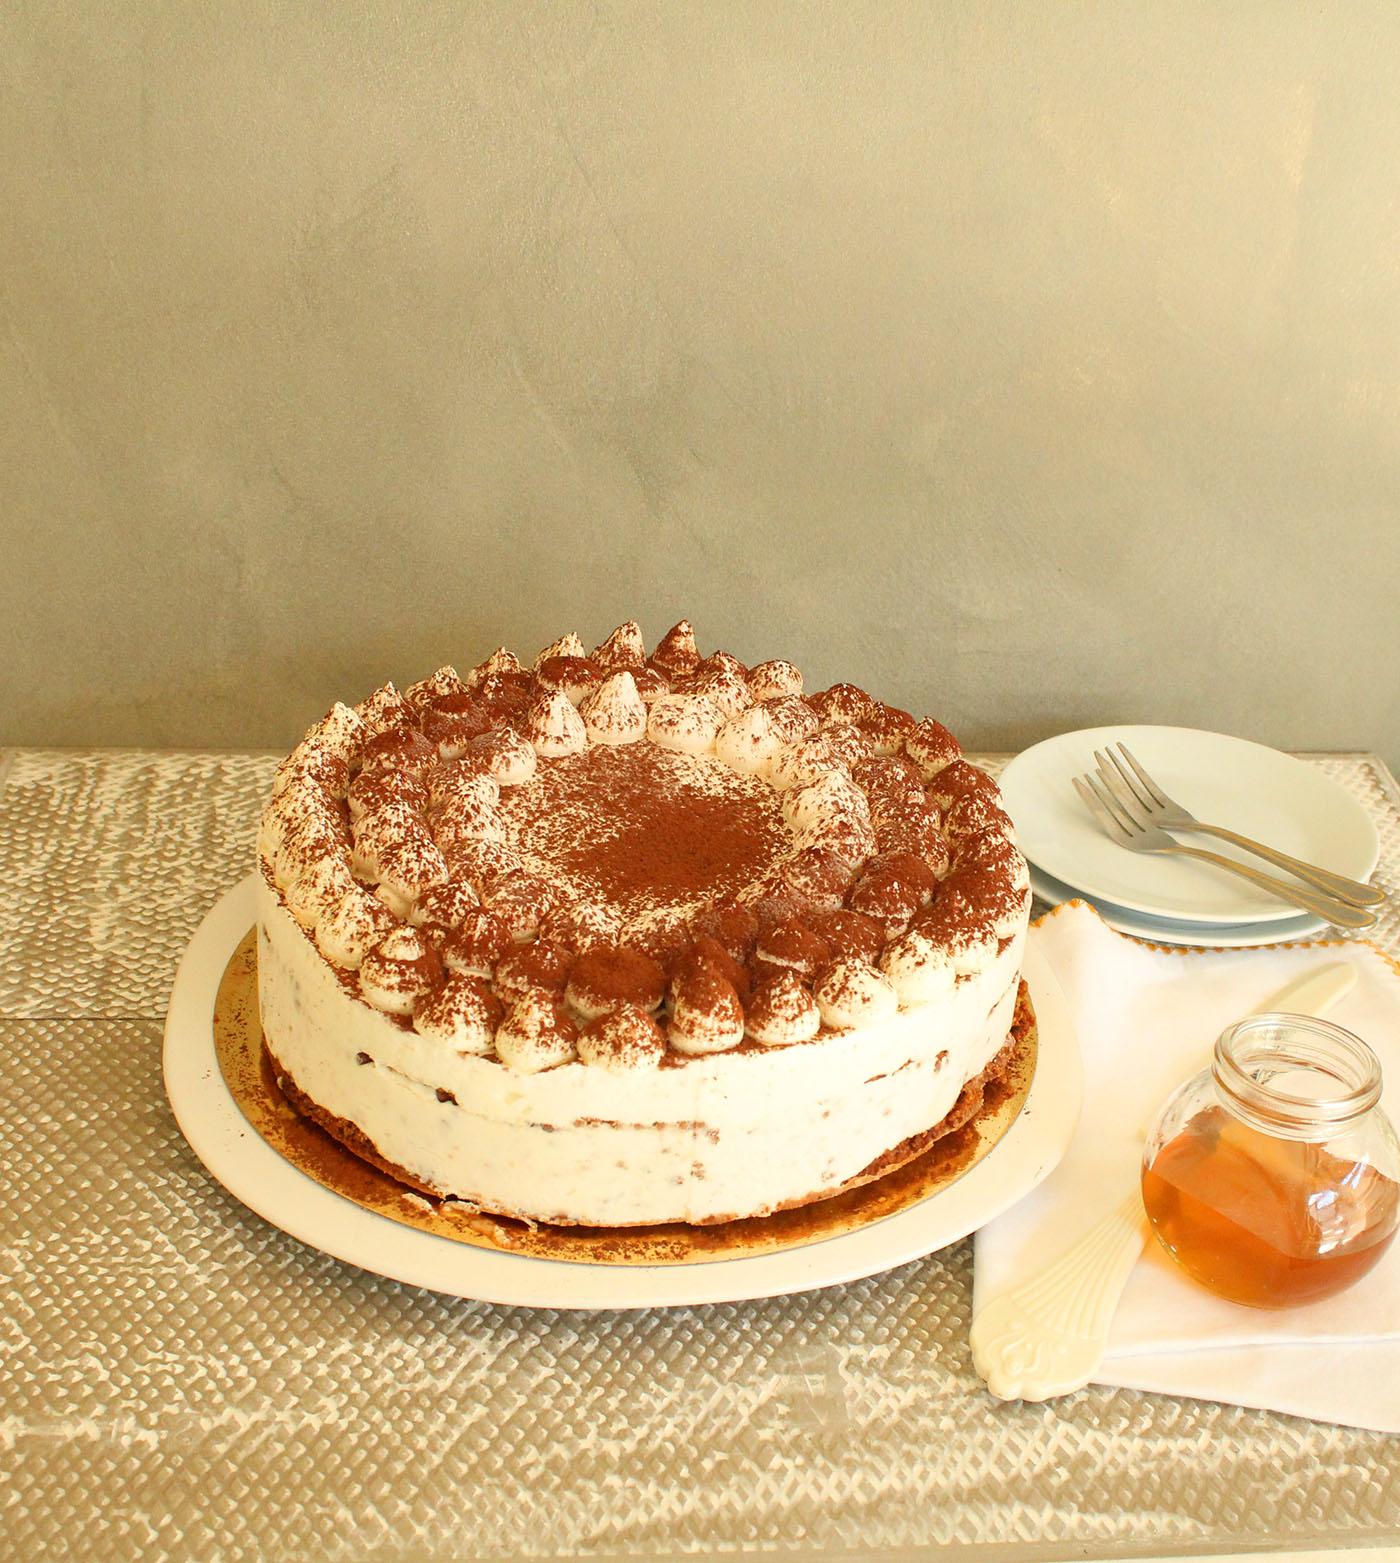 IMG 9724 - עוגת טרימיסו דבש ופקאן